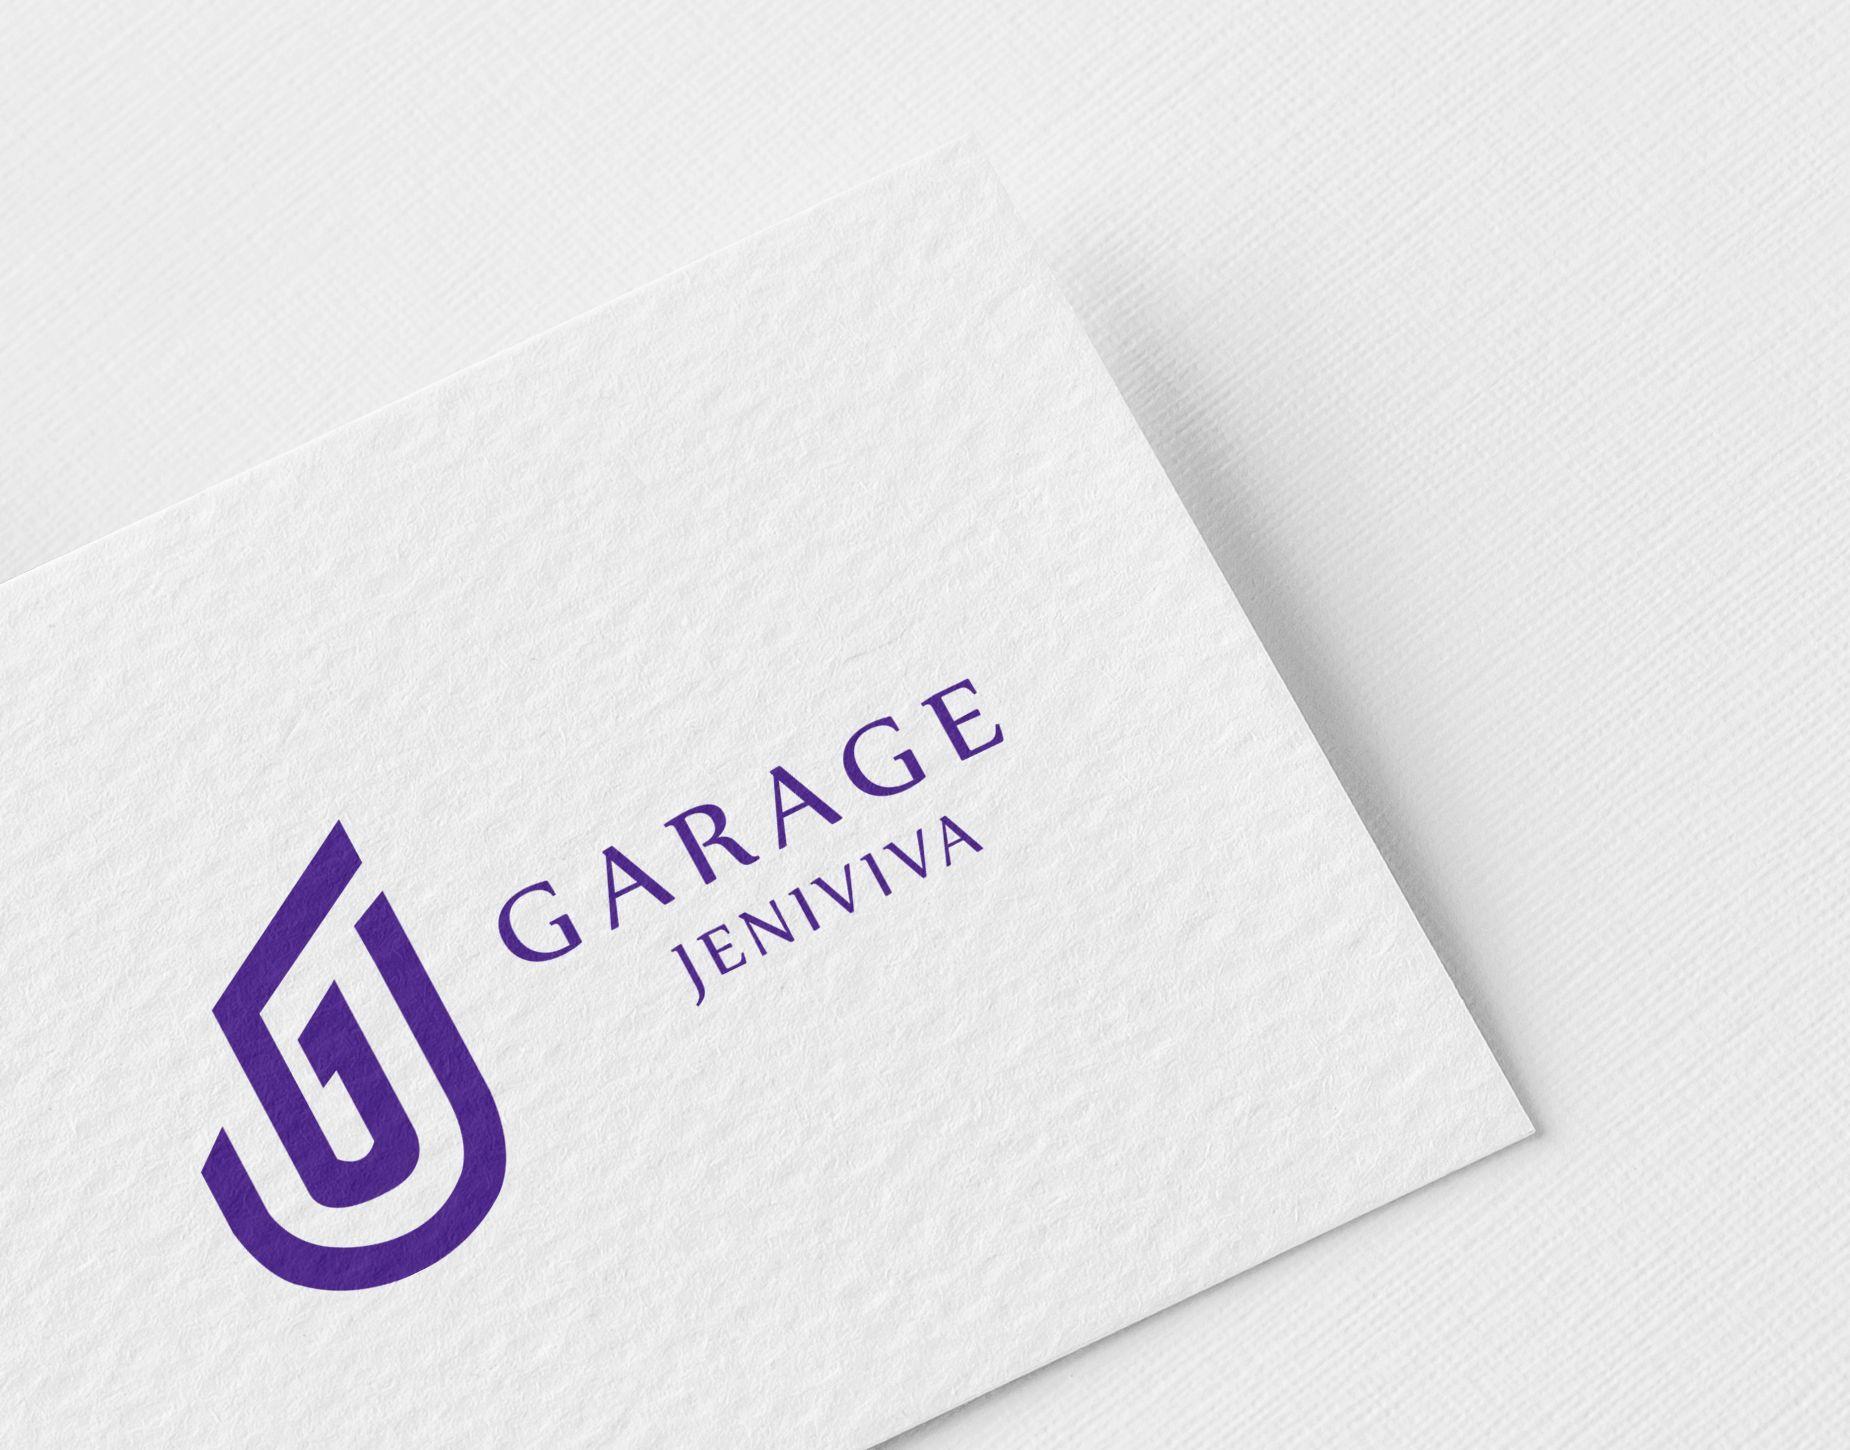 Garage Jeniviva Logo